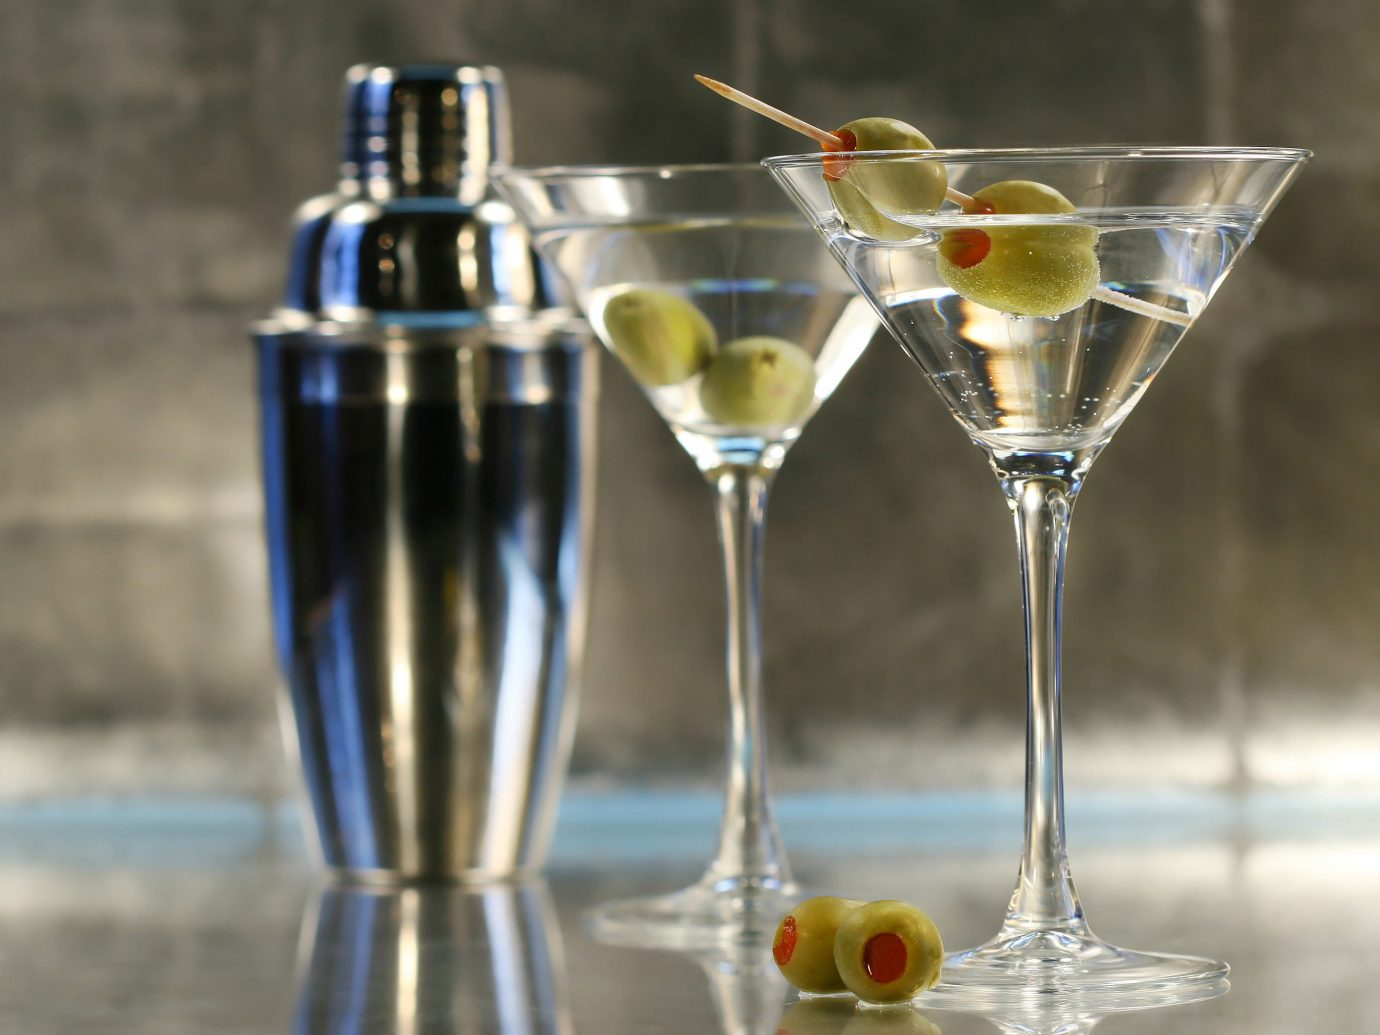 Food + Drink wine glasses Drink alcoholic beverage cocktail martini empty distilled beverage glass half champagne stemware